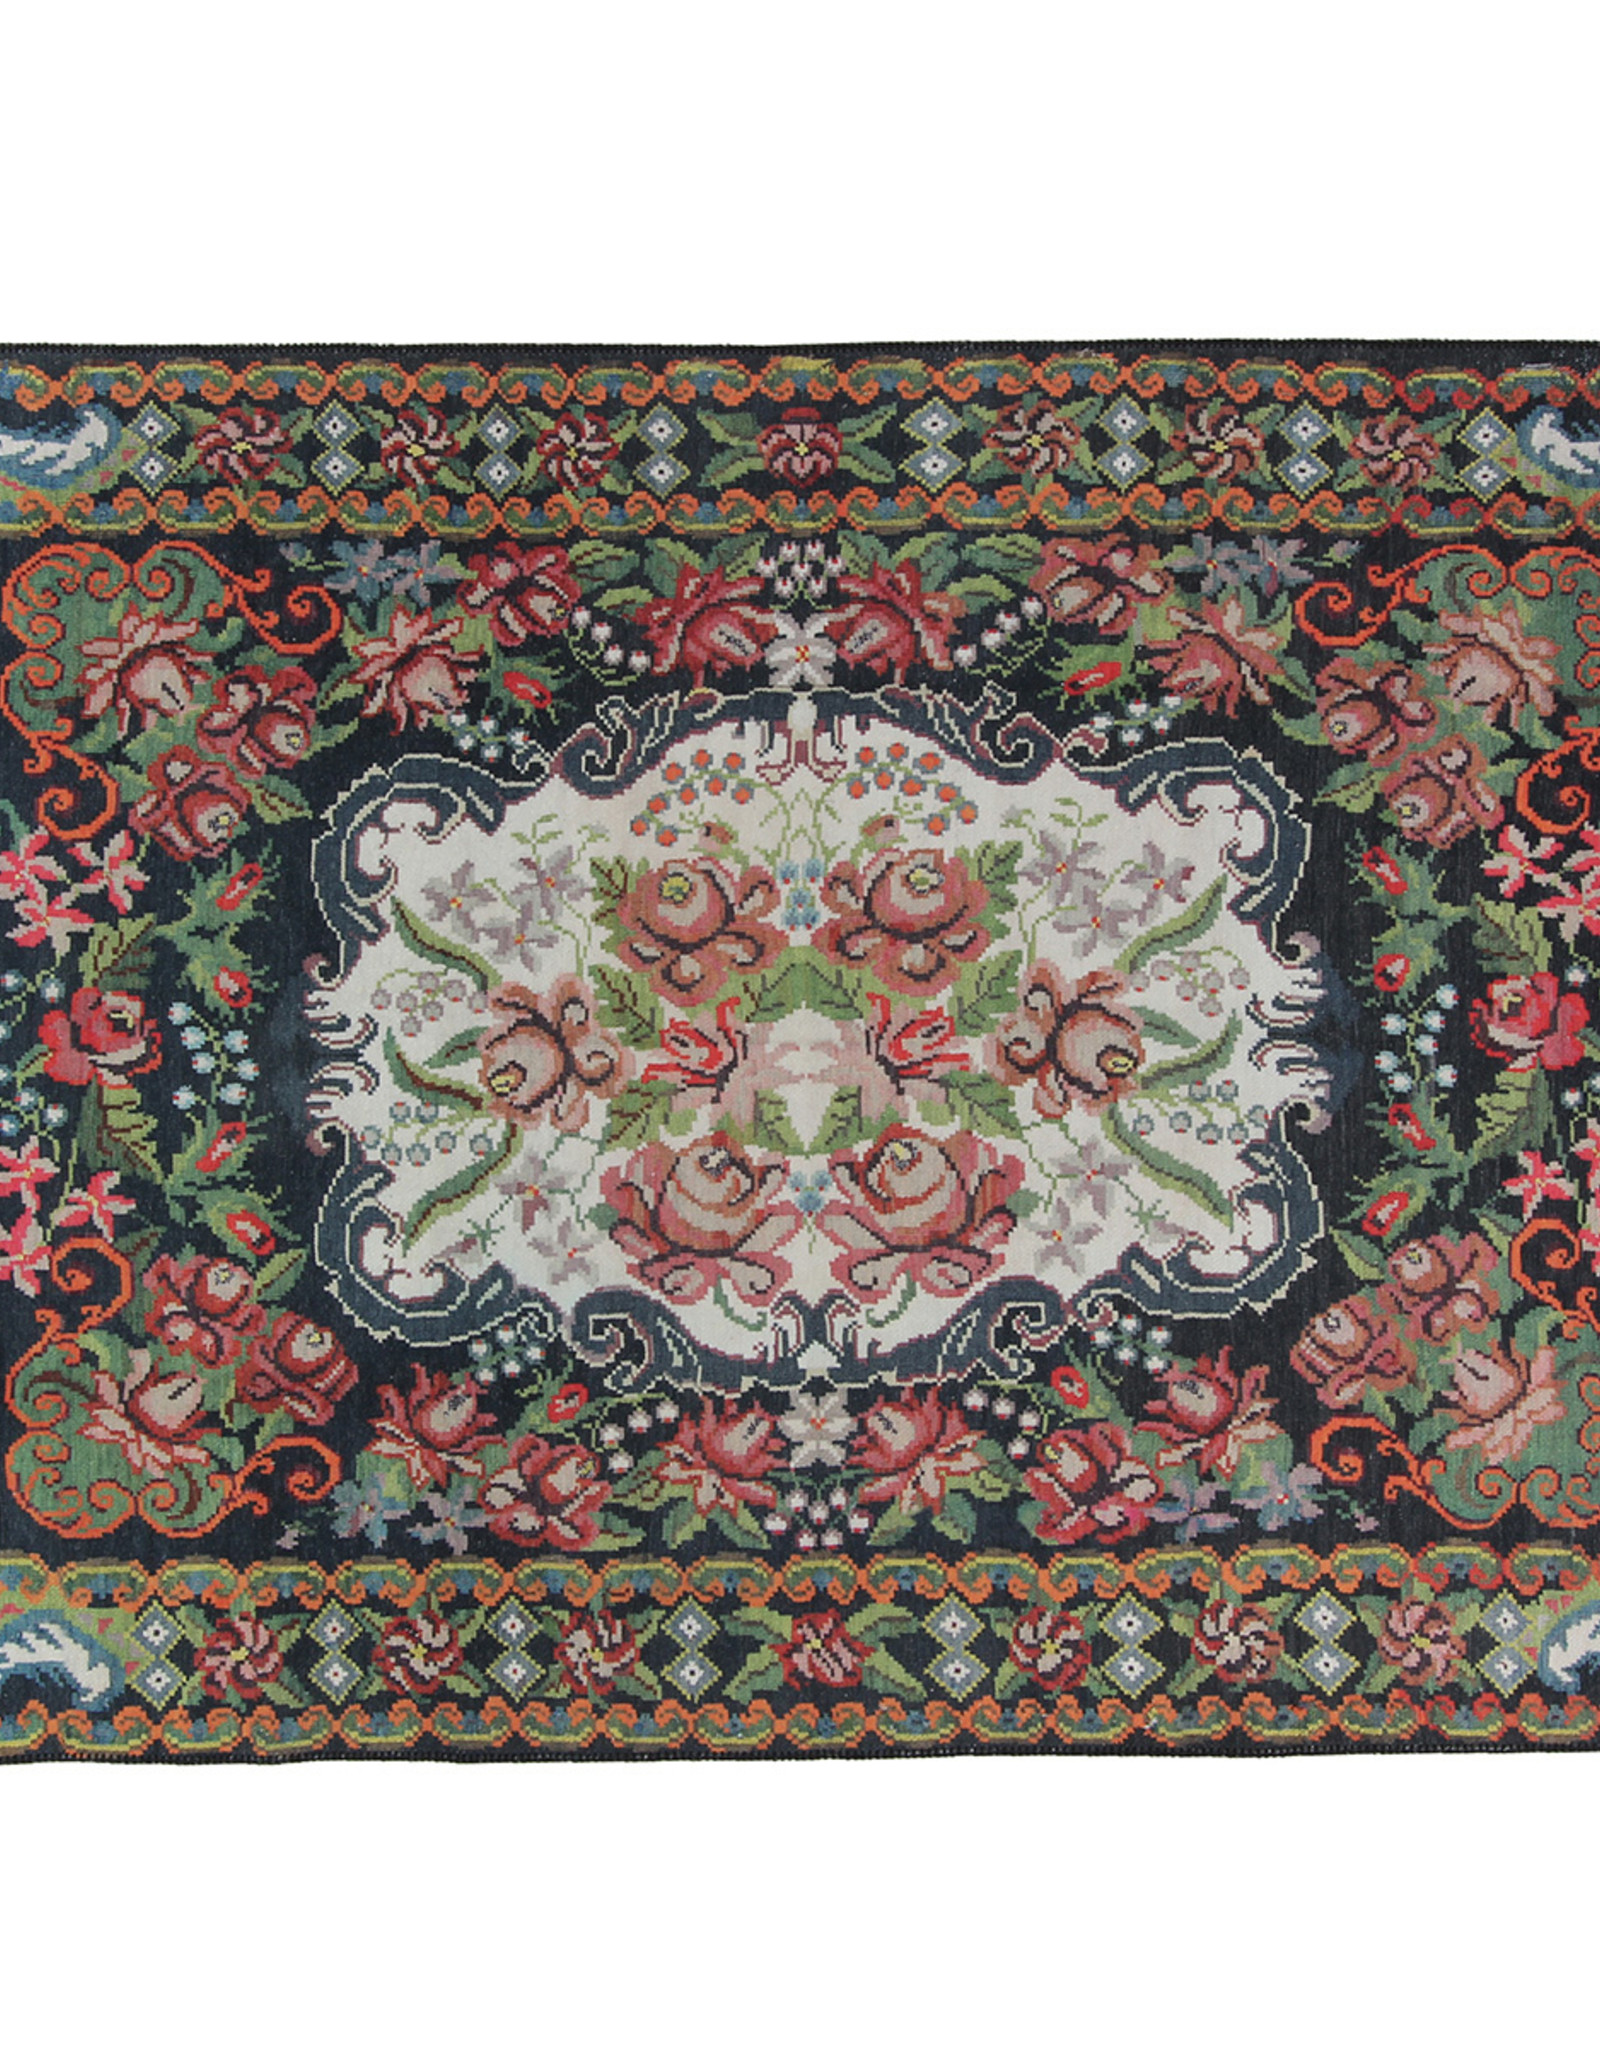 Brinker Carpet Xotin Rose 190x290cm